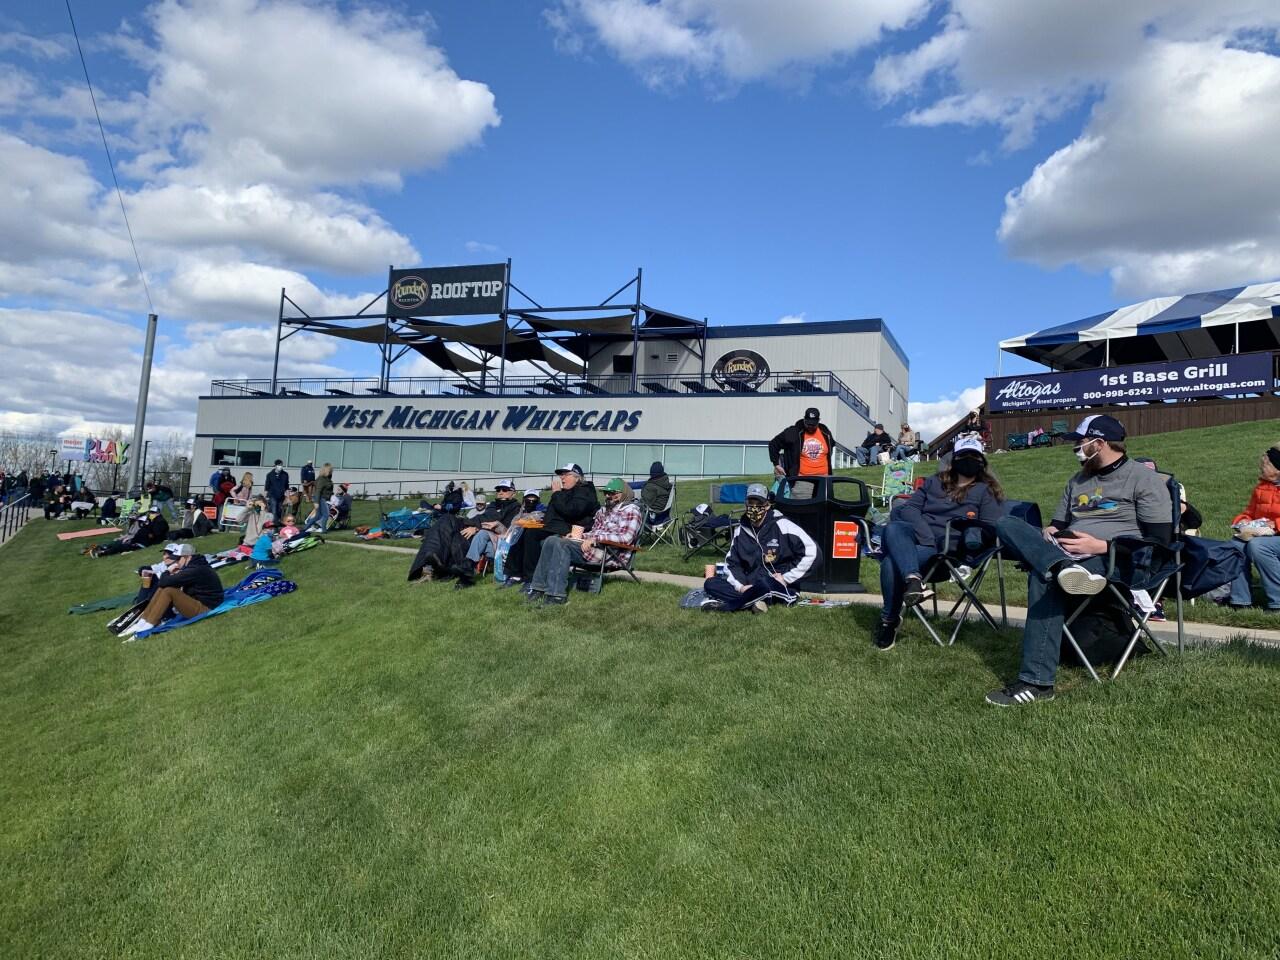 Whitecaps fans enjoy the lawn